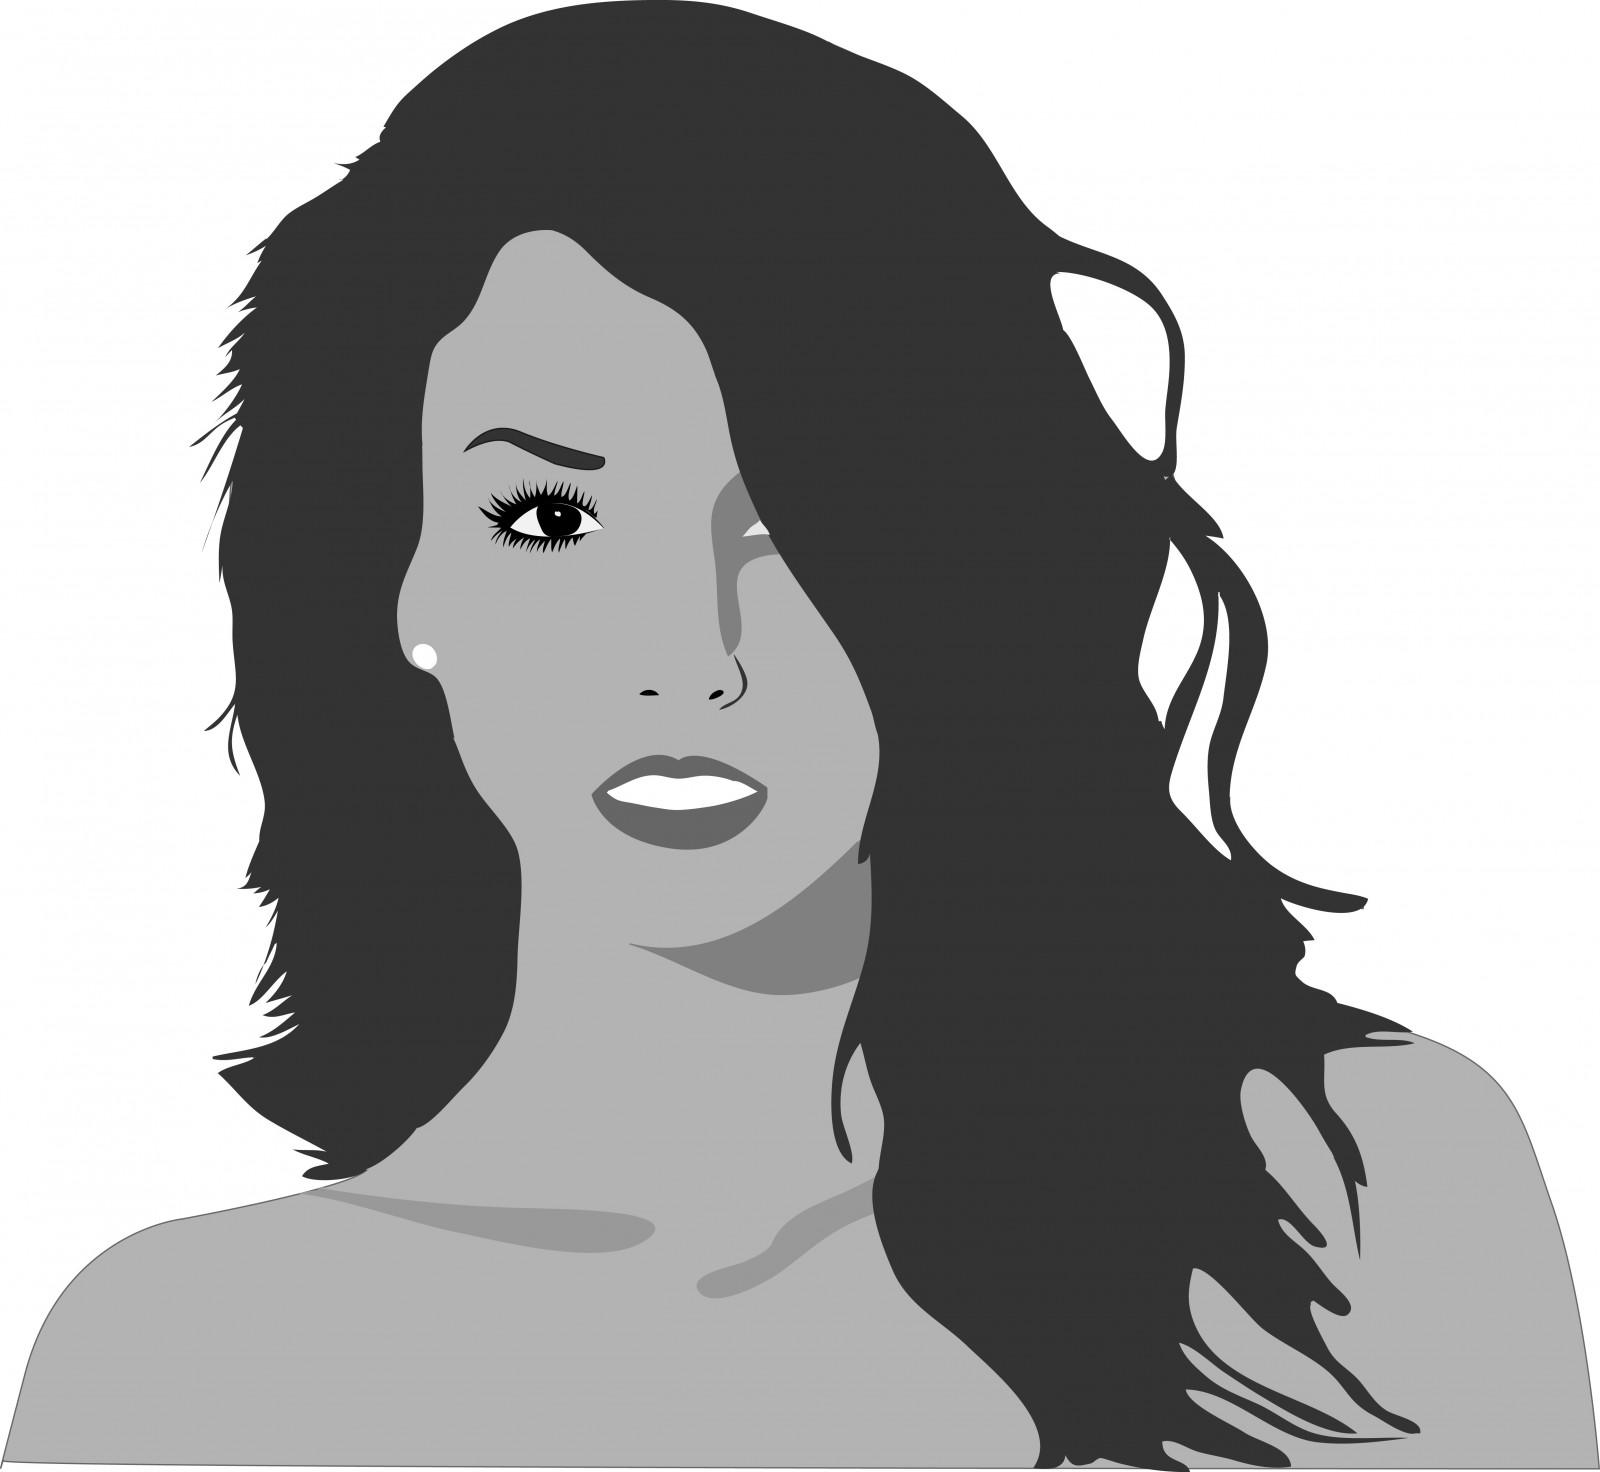 Fond D Ecran Visage Illustration Femmes Monochrome